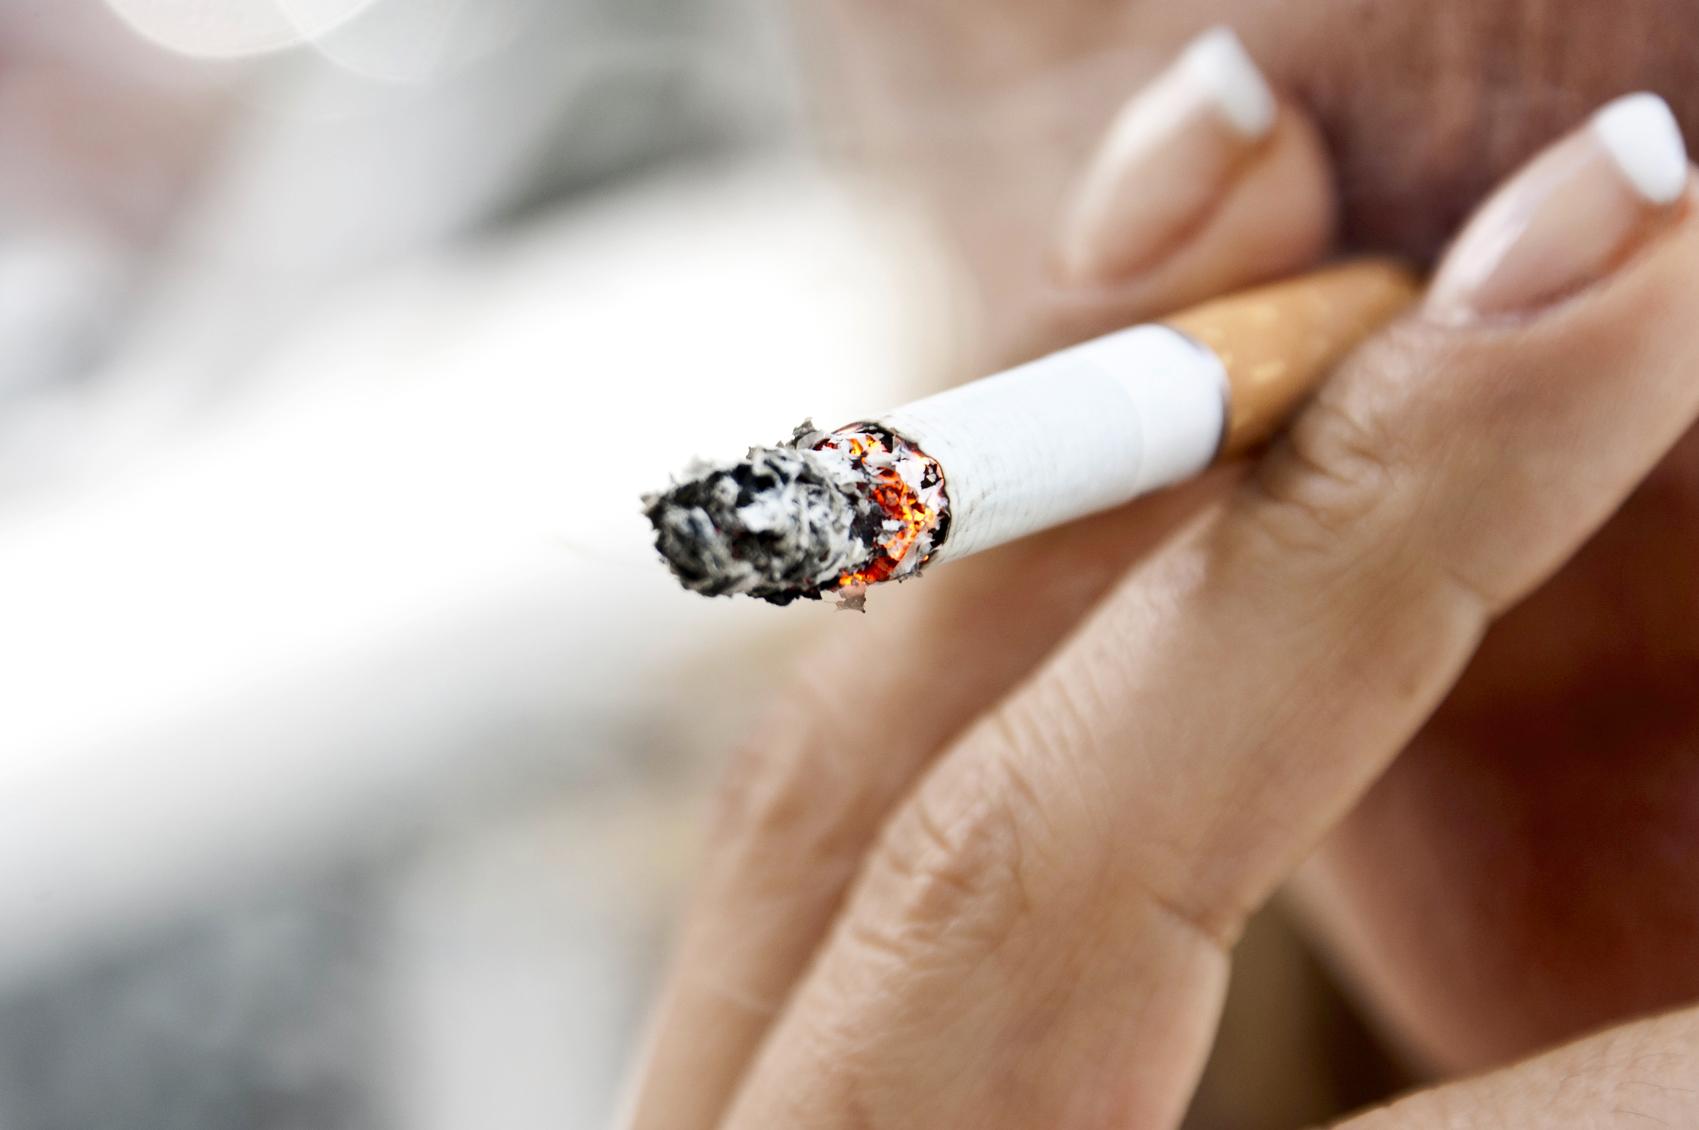 Maladies de l'intestin: l'effet paradoxal du tabac - Planete sante